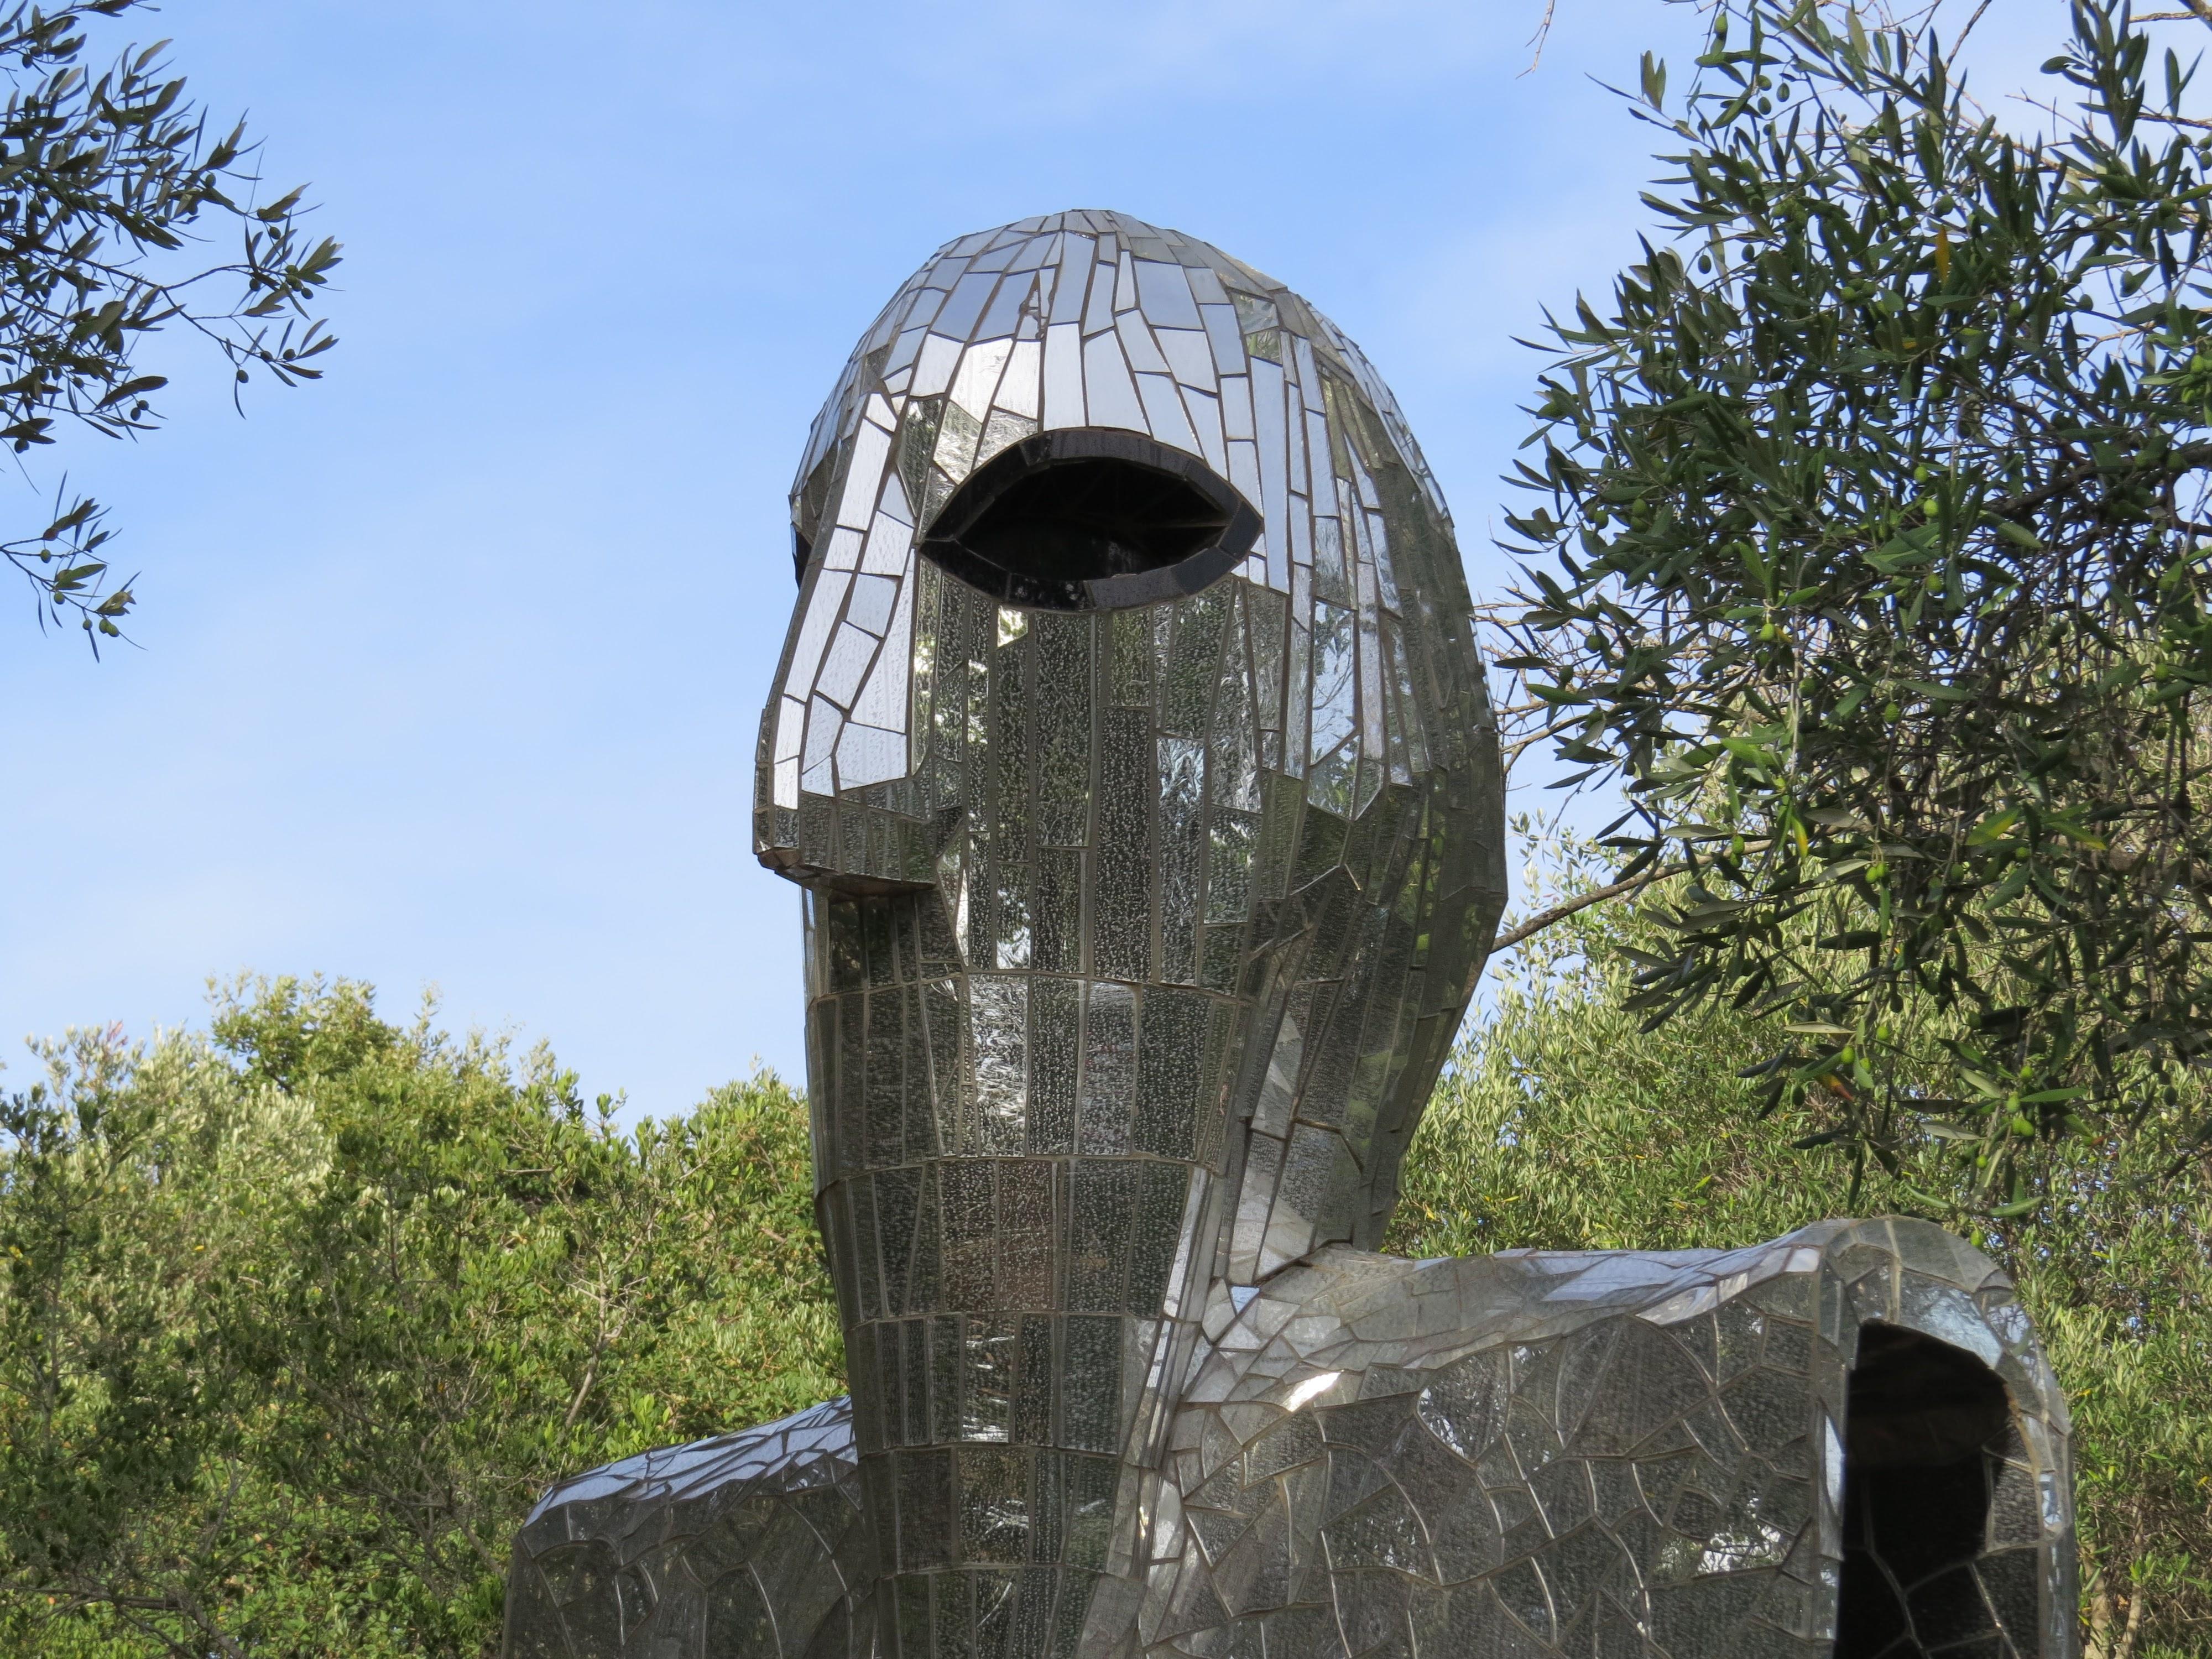 Niki de Saint Phalle, L'Eremita (particolare), Giardino dei Tarocchi, Capalbio